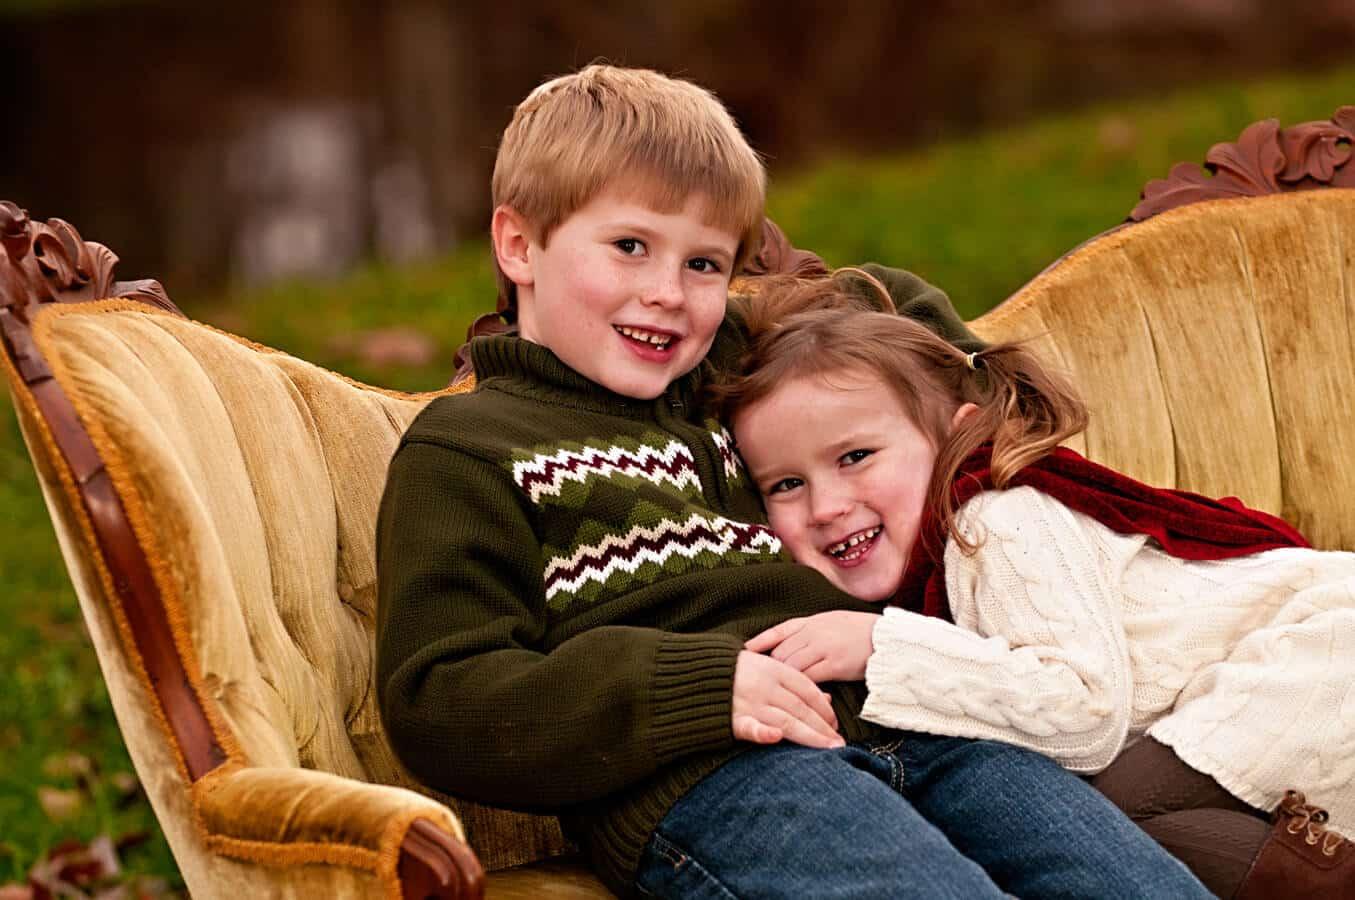 children, portrait, sofa, outdoor, natural light, Northern VA